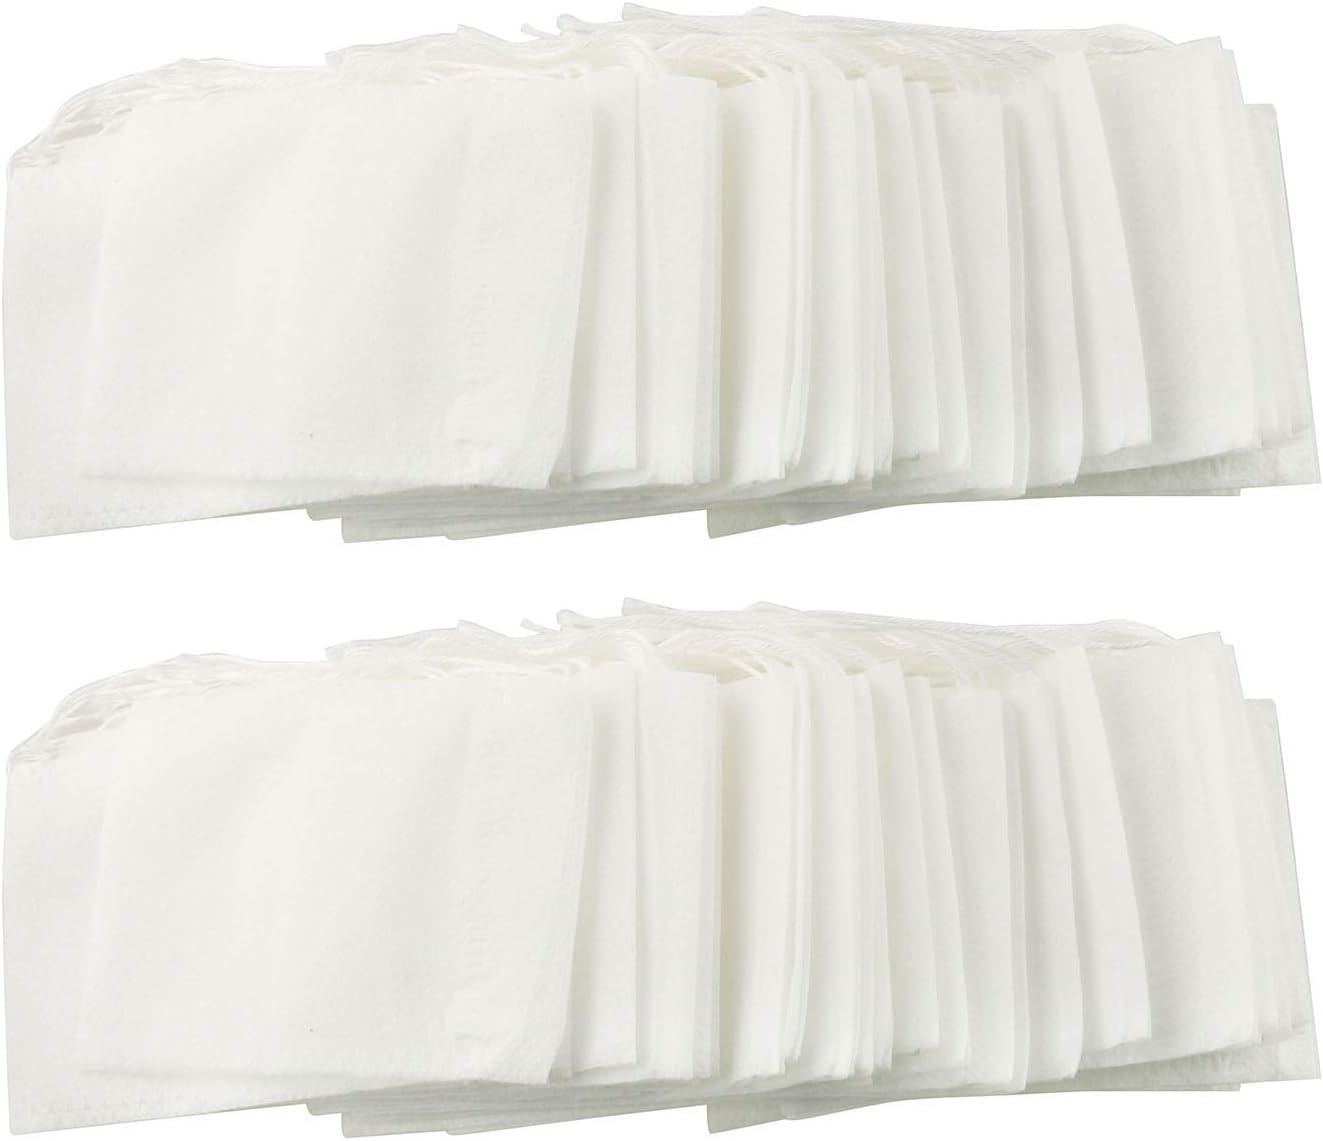 Tegg Empty Tea Filter Cheap SALE Start Fresno Mall Bag Disposable Filt Non-woven 7x9cm 100PCS